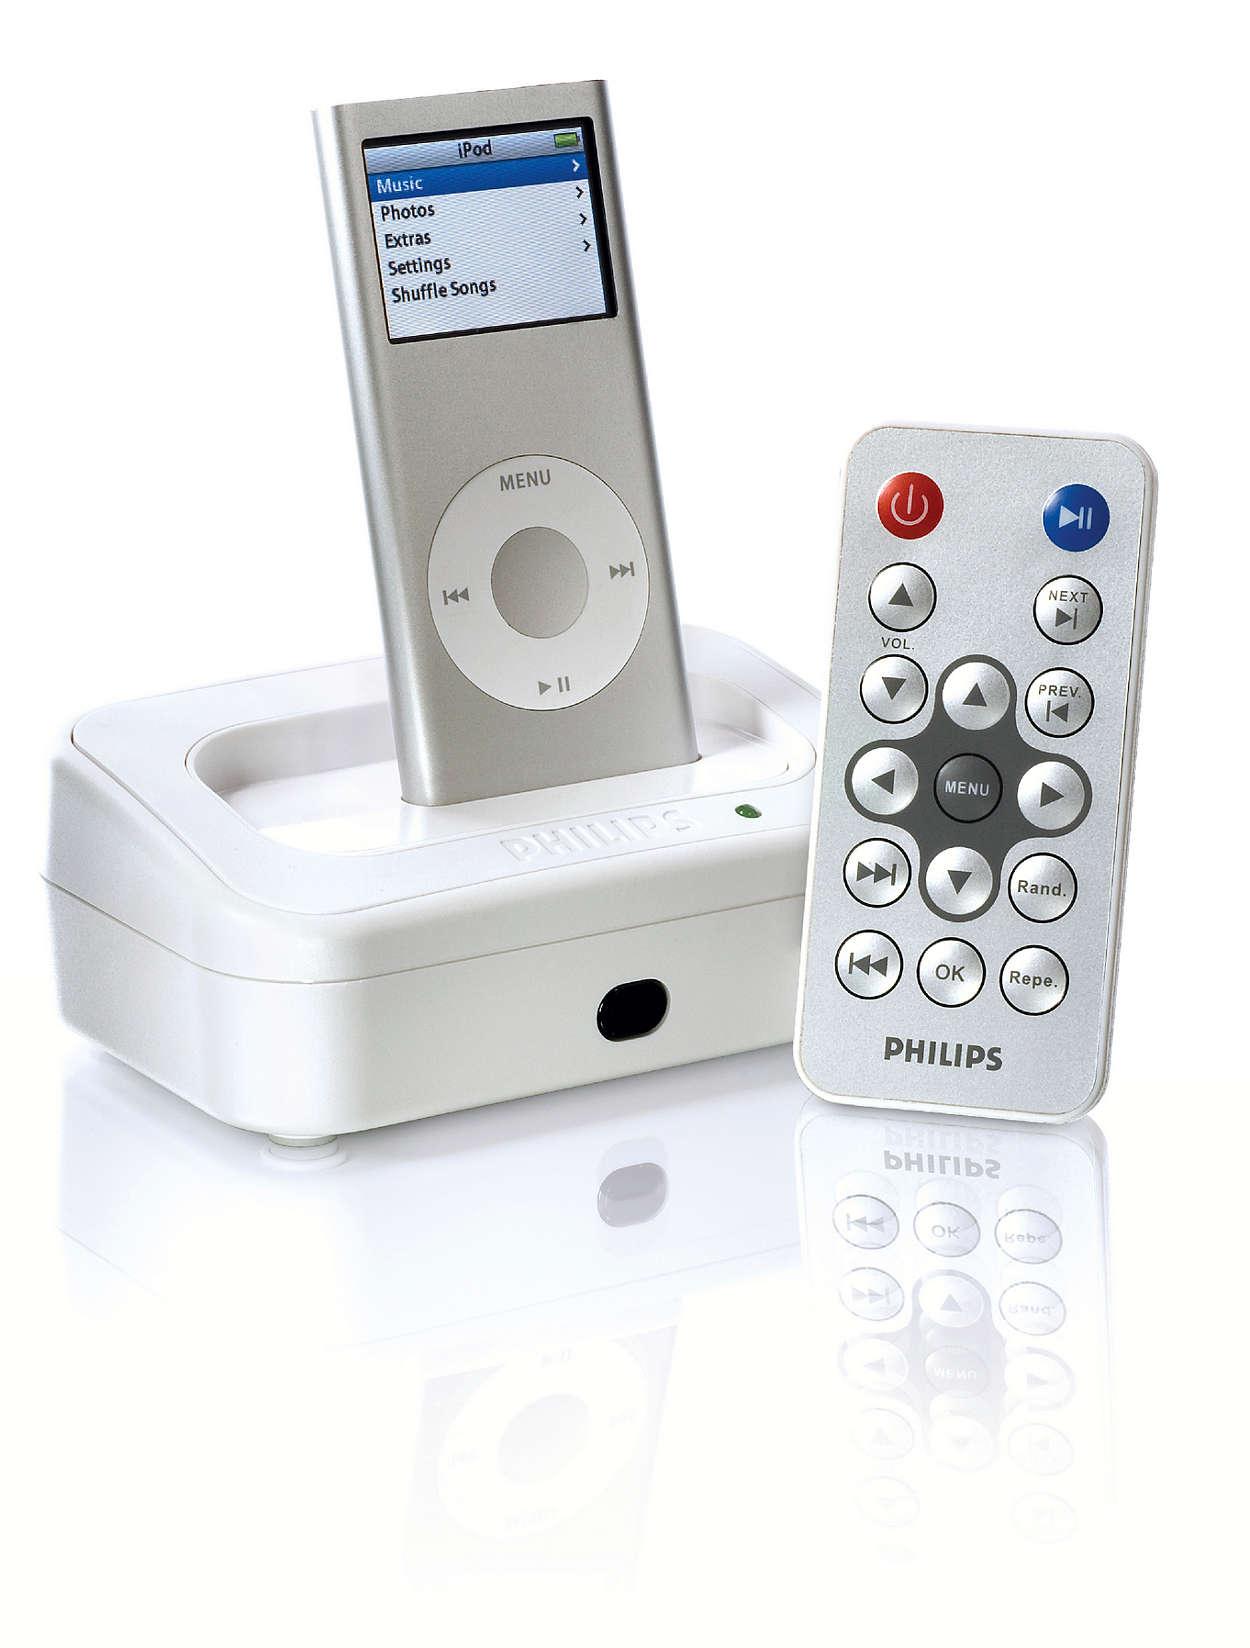 Synchronisez votre iPod